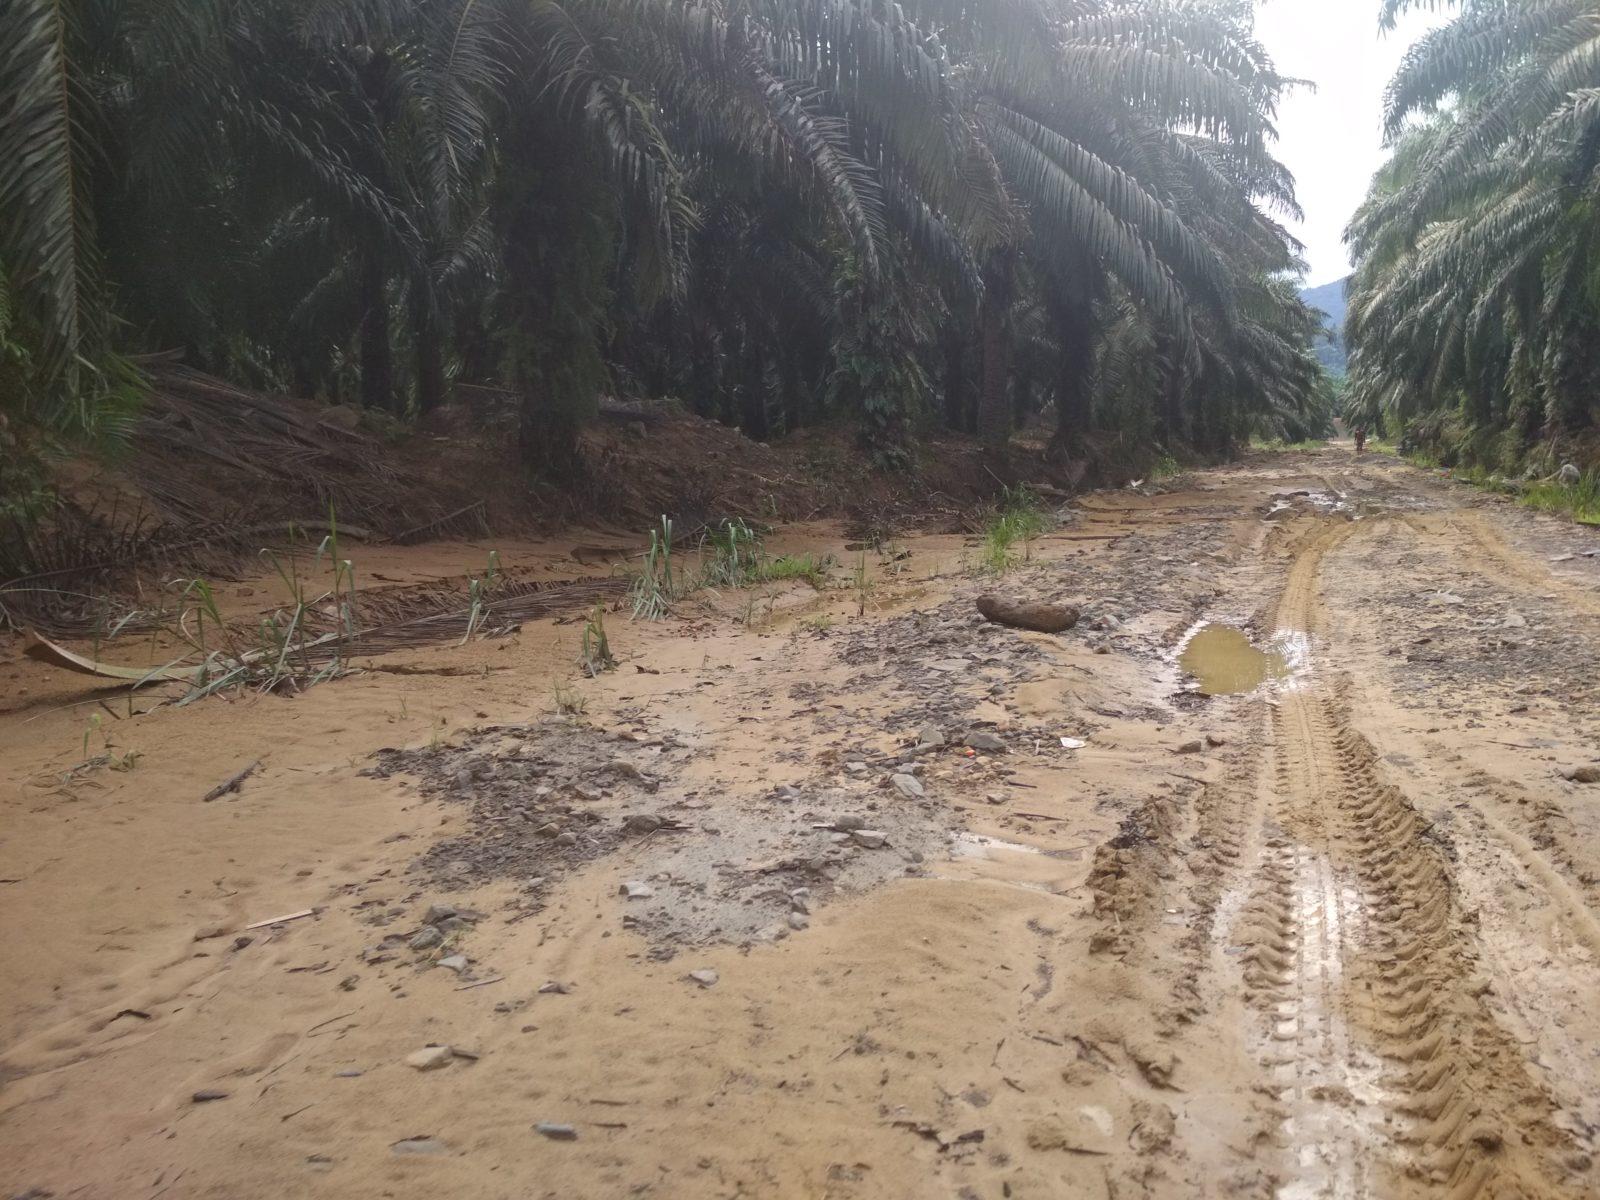 Der Zugang zu den Plantagen wird durch den schlechten Zustand der Straßen erschwert © Rizal Assalam